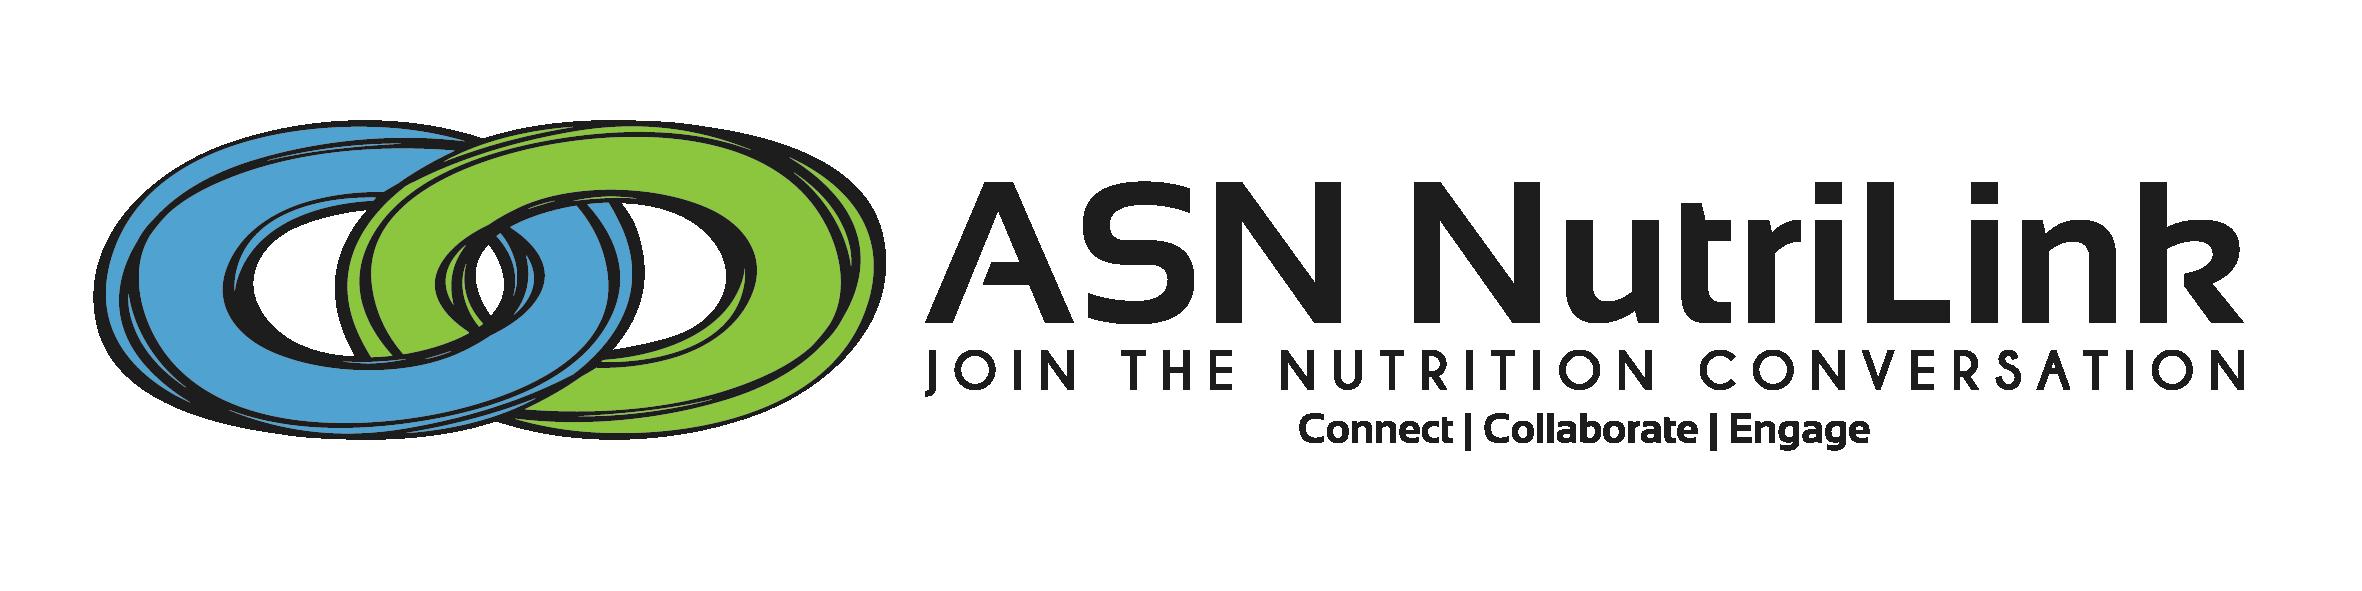 ASN NutriLink Horizontal Logo-01-01 – American Society for